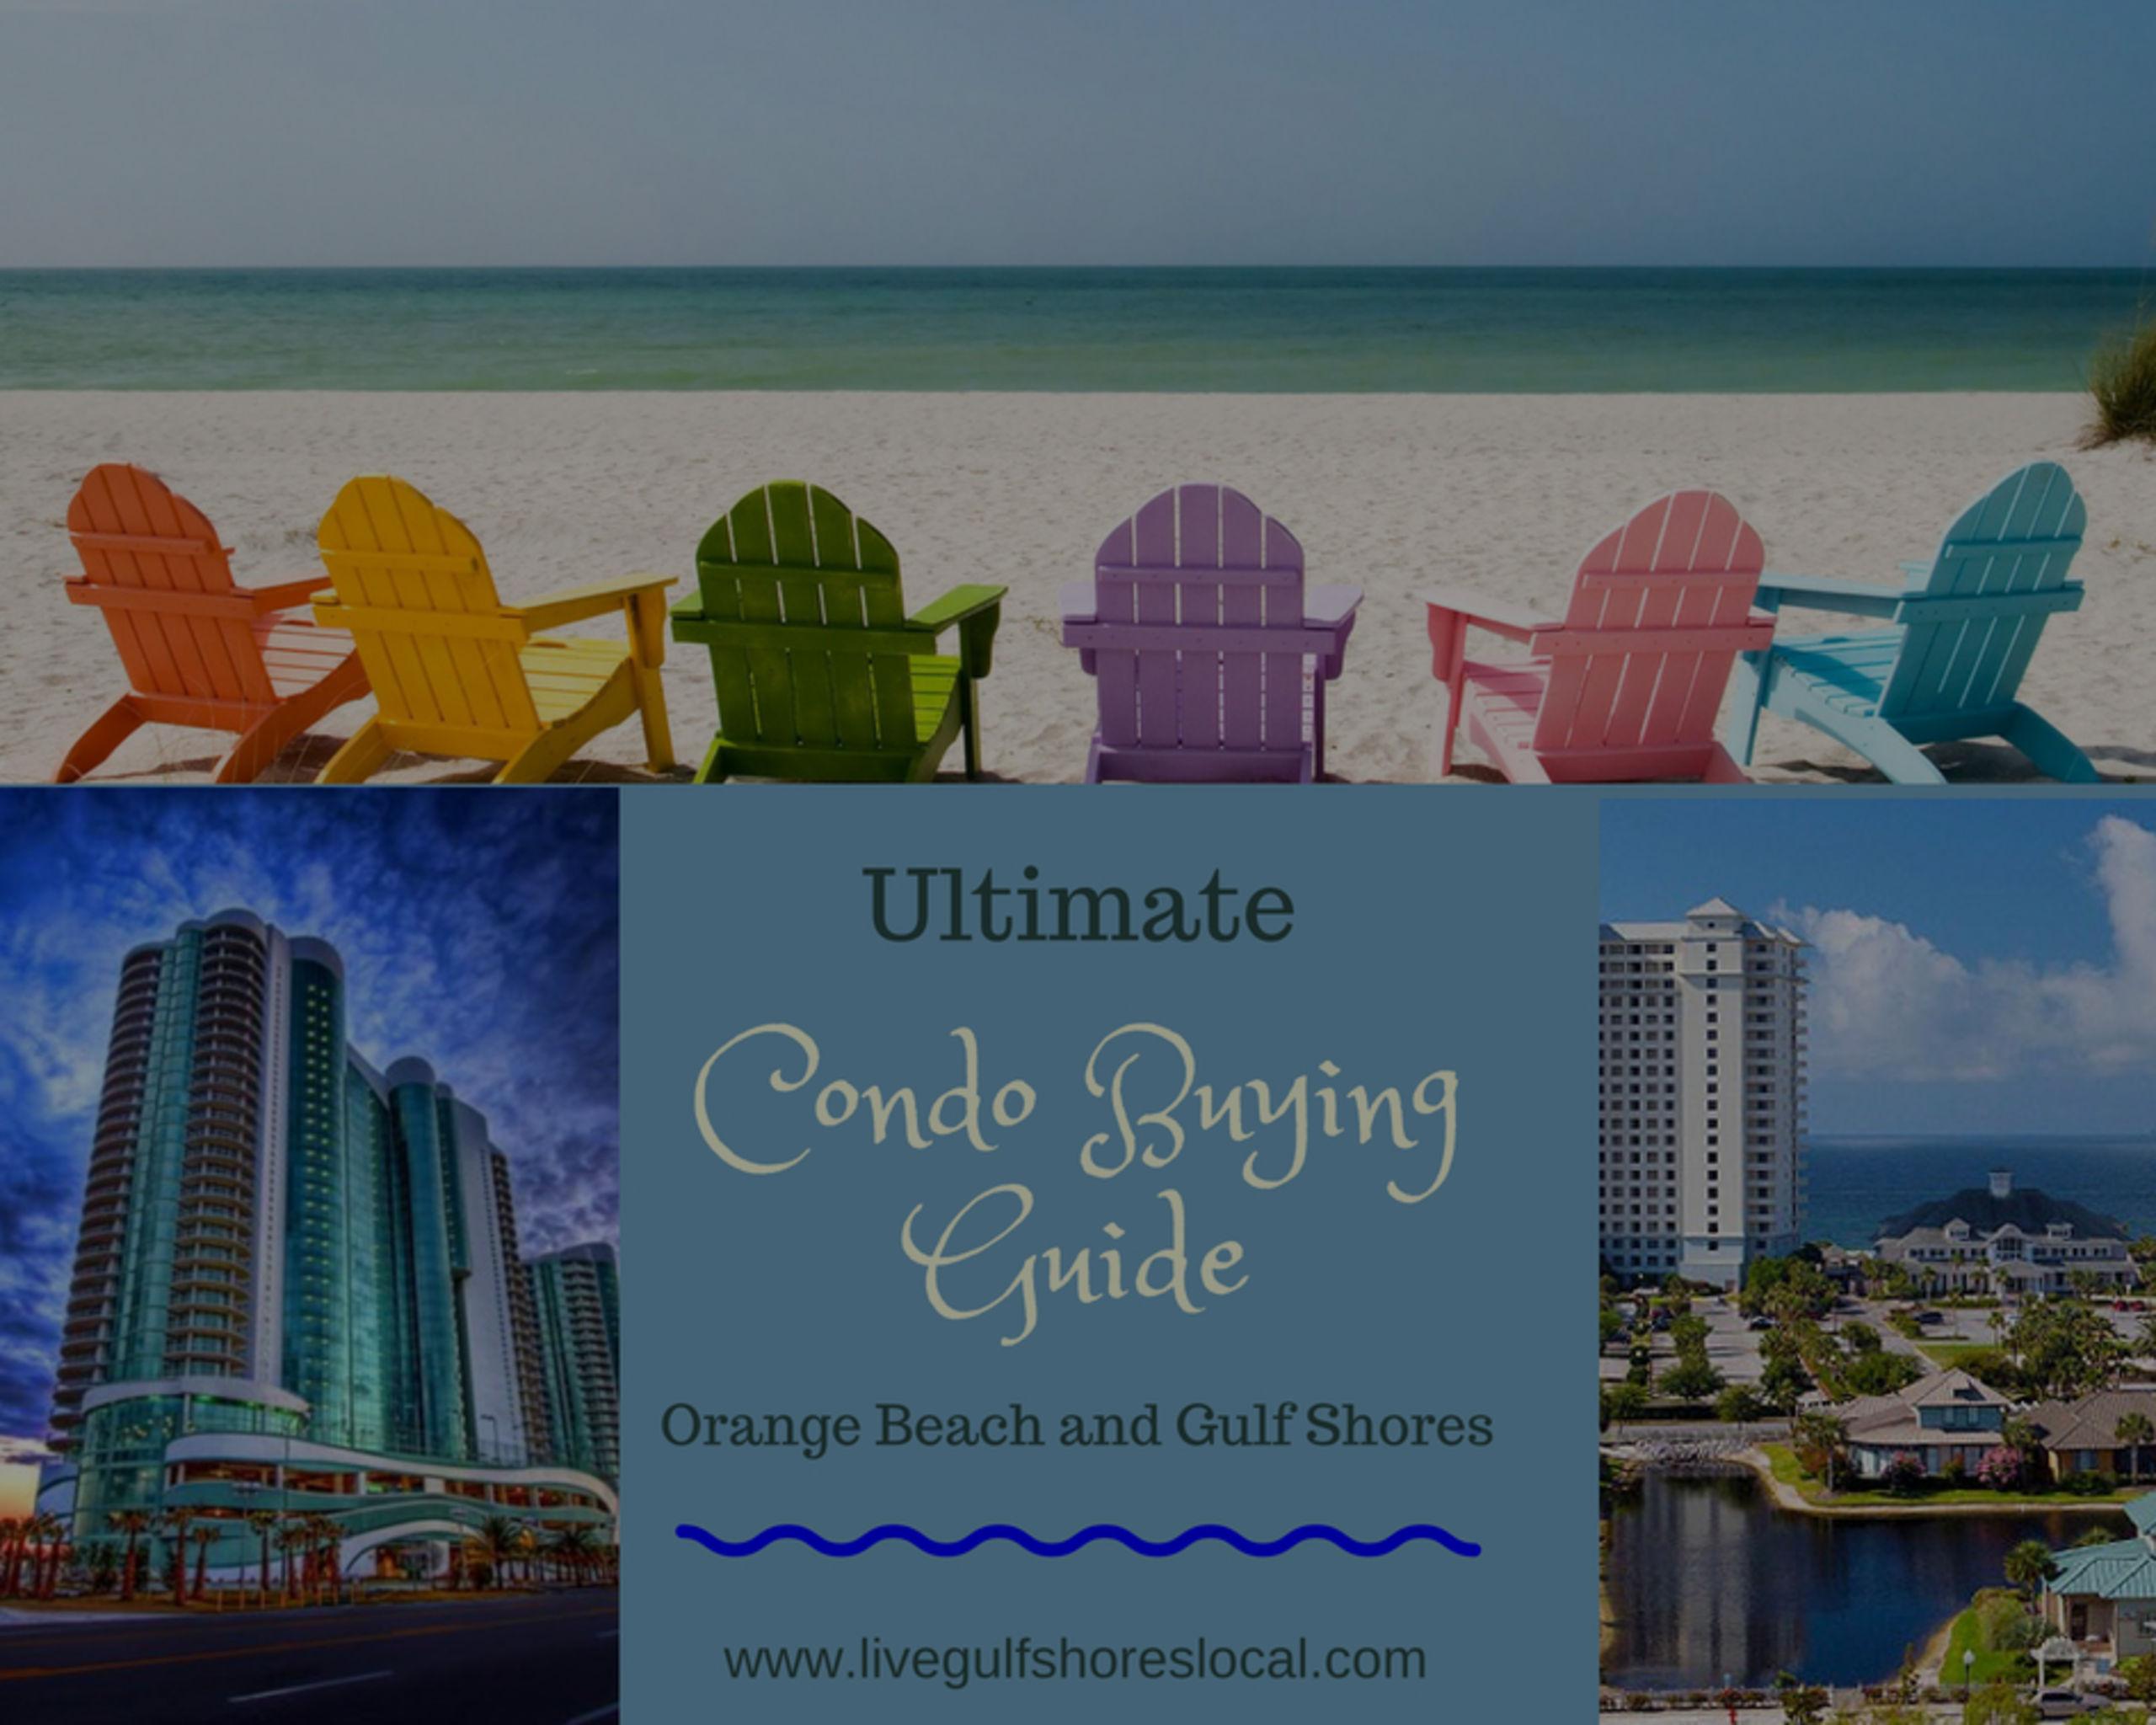 Ultimate Condo Buying Guide – Orange Beach and Gulf Shores